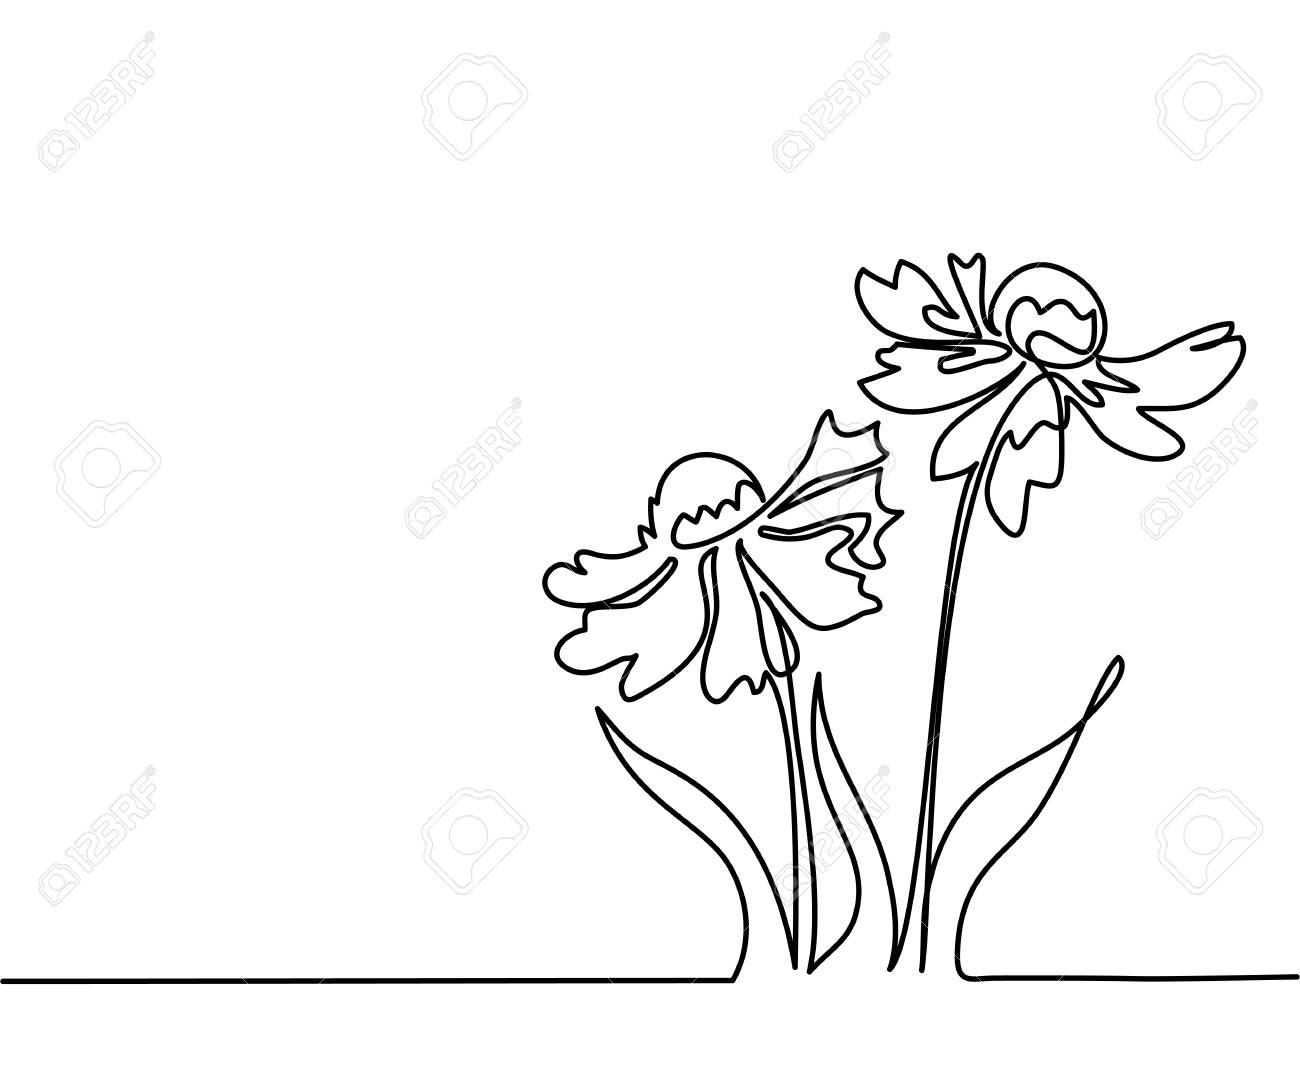 Continuous Line Flower Wiring Diagrams Onan Diagram 6126628 Beautiful Flowers Echinacea Drawing Vector Rh 123rf Com Plant Sun